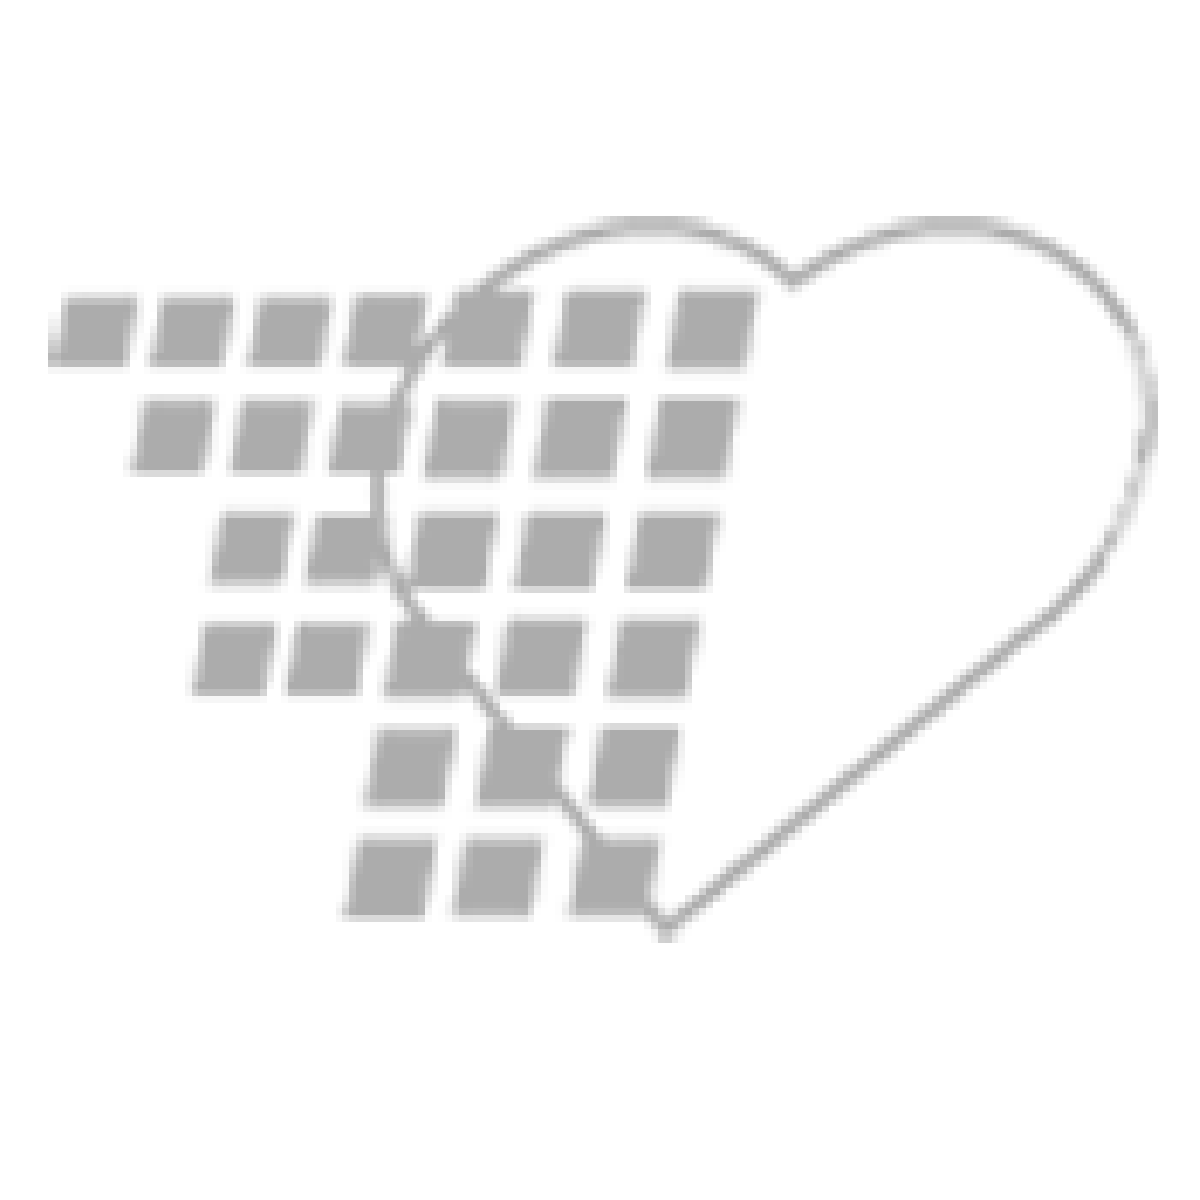 06-93-6925 Demo Dose® Oxytocn Pitocn 10 units mL 1 mL